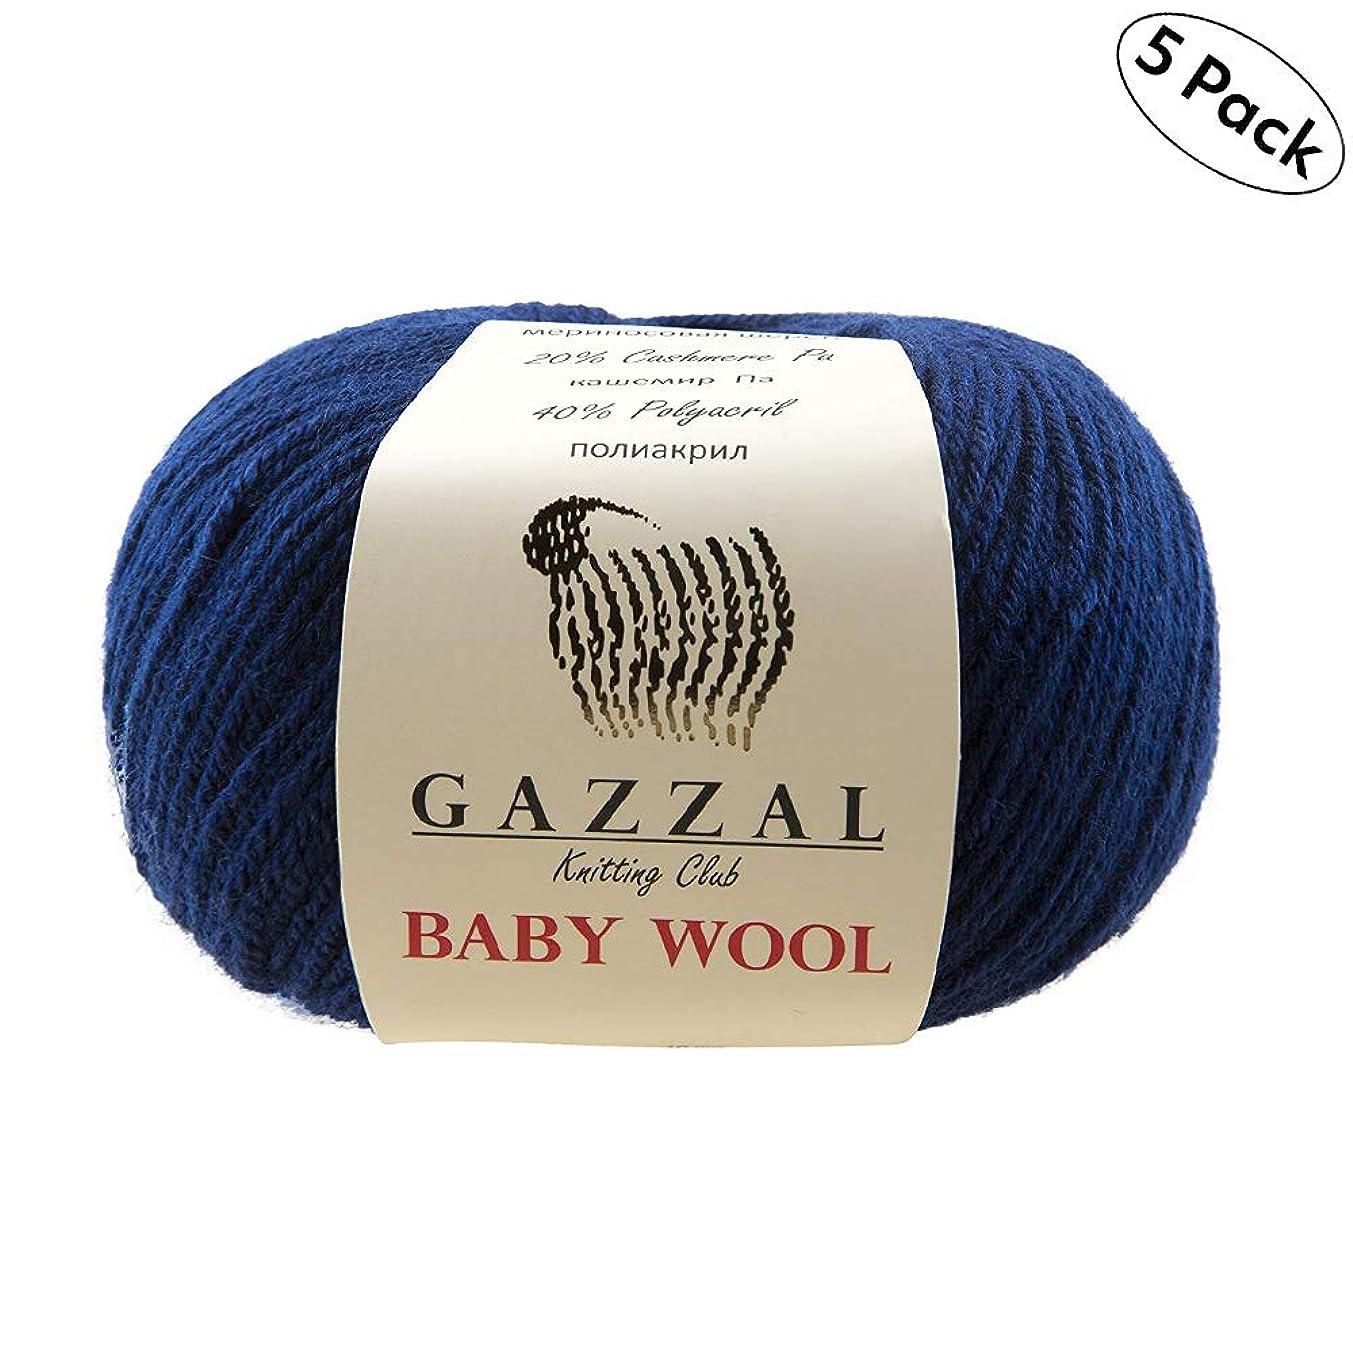 5 PACK - Gazzal Baby Wool 1.76 Oz (50g) / 218 Yards (200m) Fine Baby Yarn, 40% Lana Merino, 20% Cashmere Type Polyamide; (Saks Blue - 802)